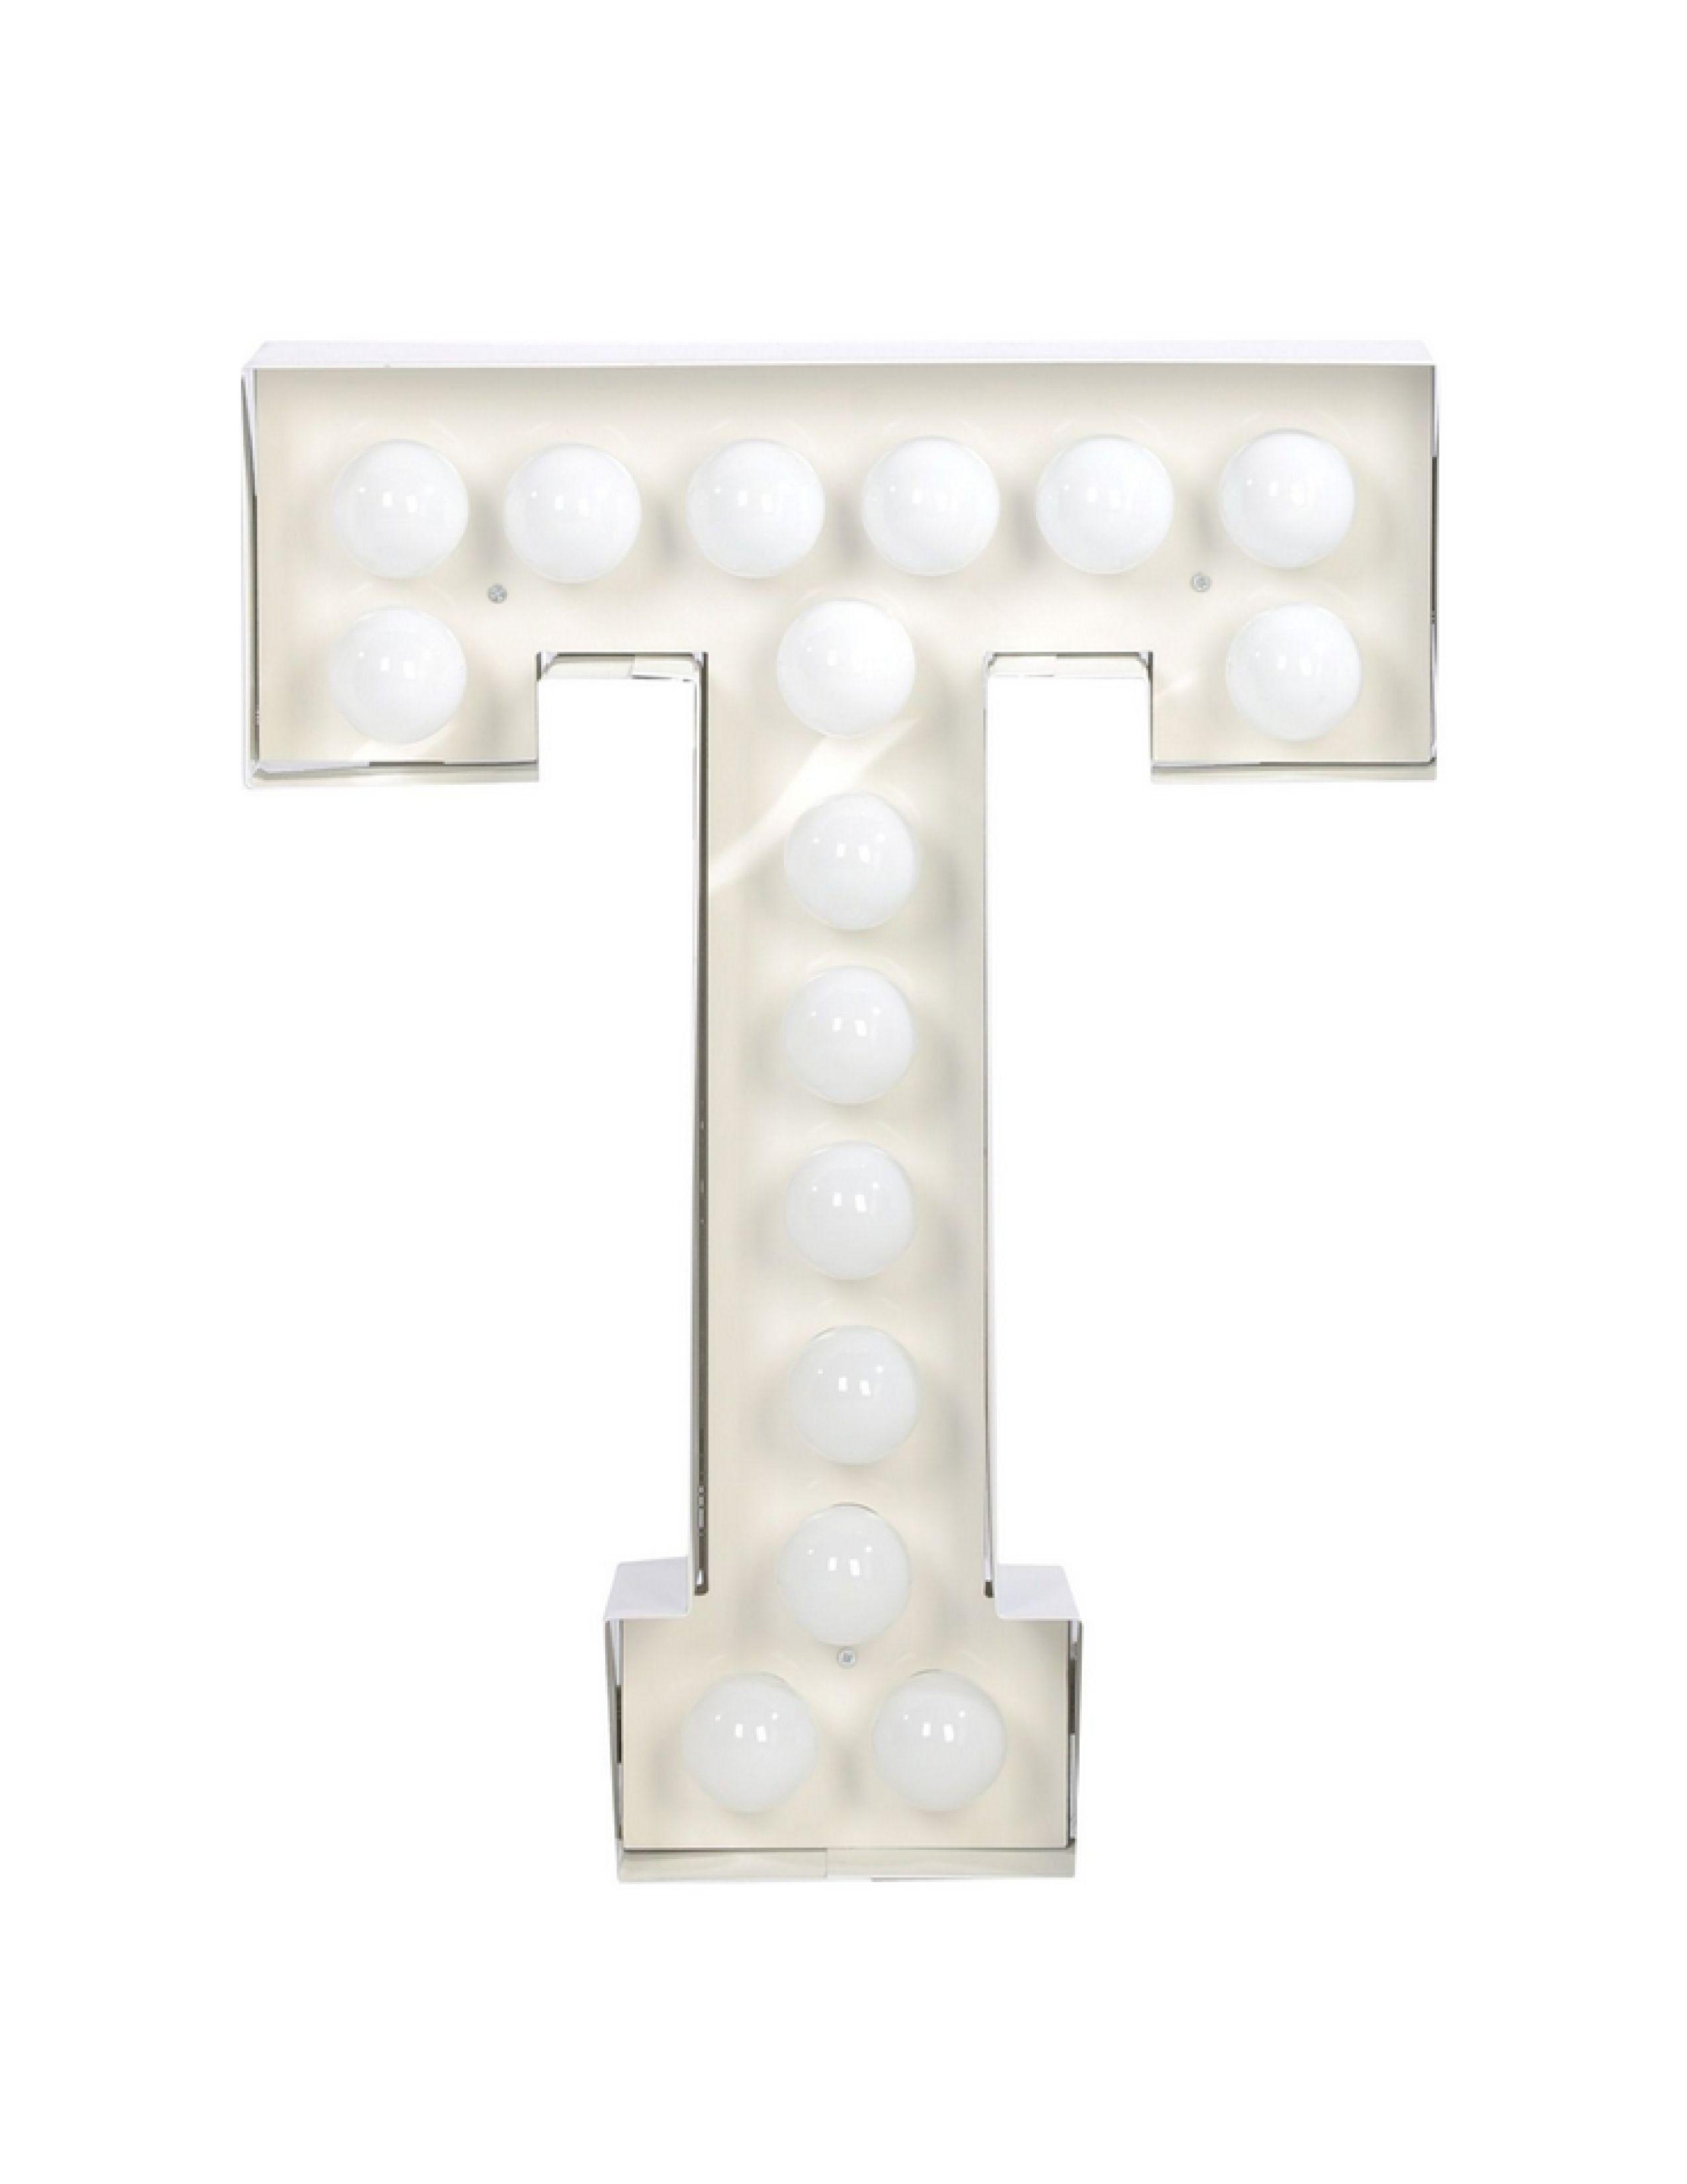 Seletti VEGAZ LED verlichting T